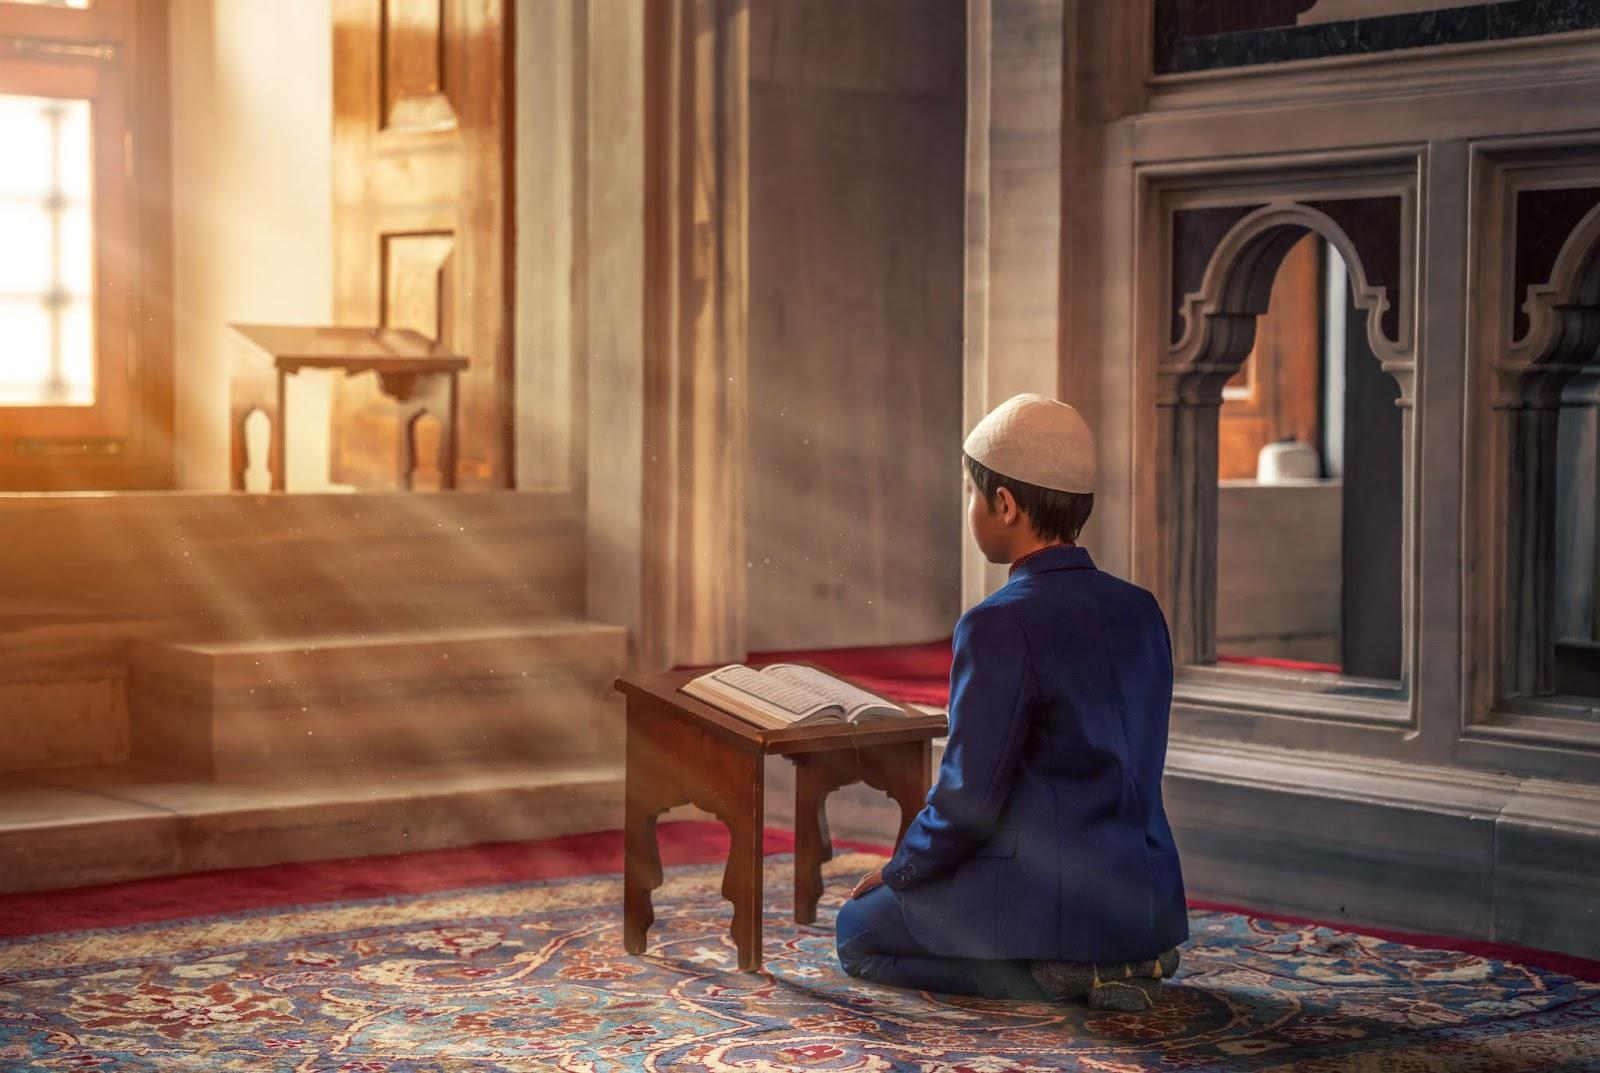 kata-kata bijak tema islami penuh yang unik dan paling keren